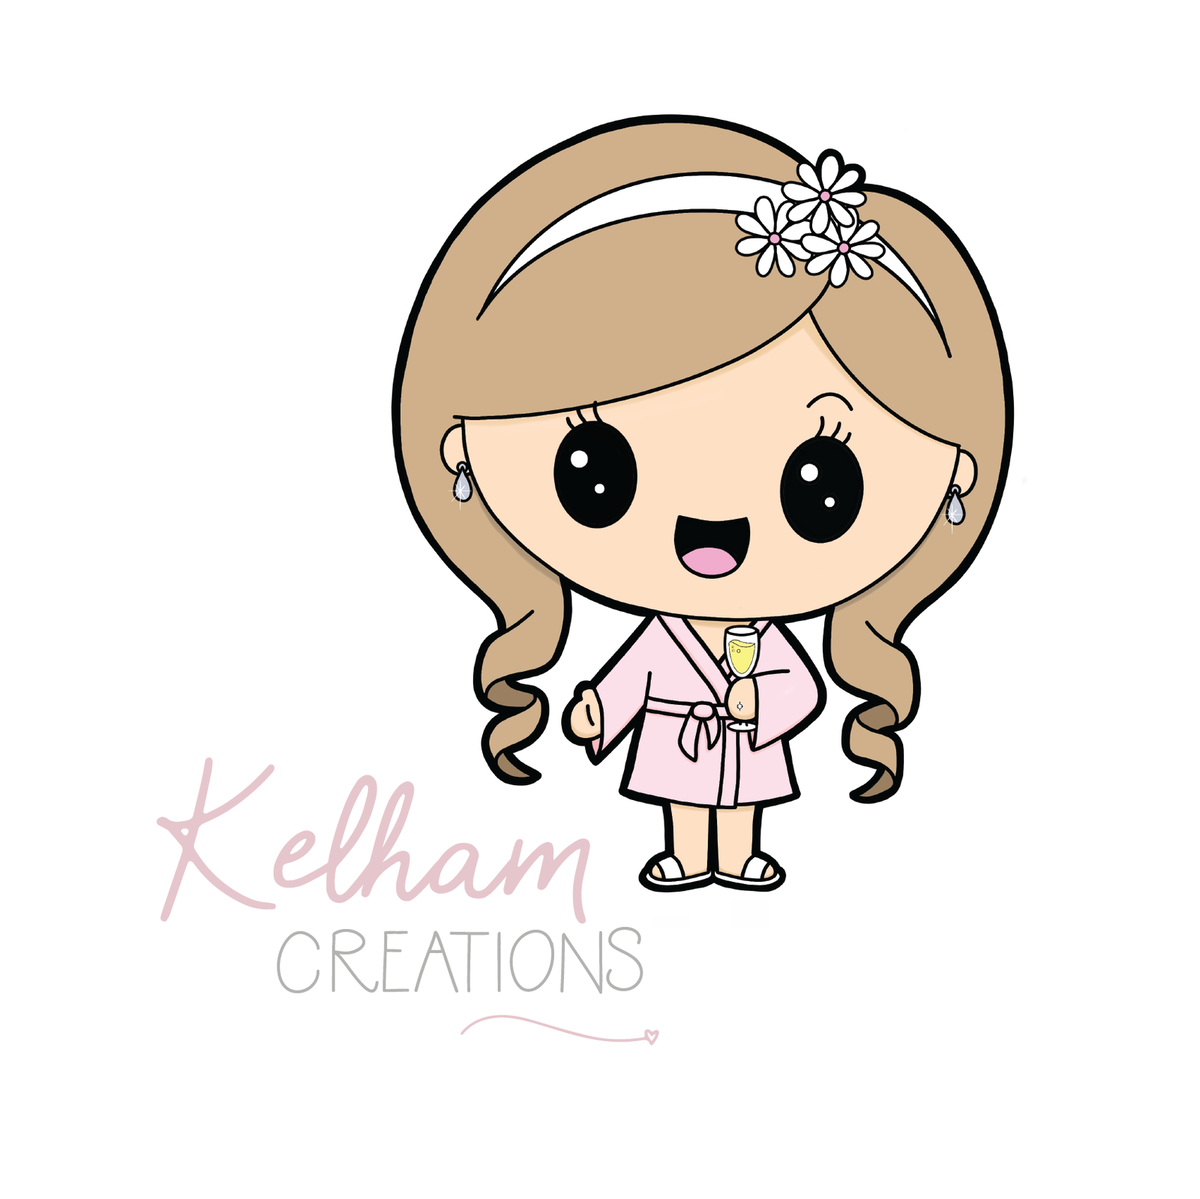 kelhamcreations